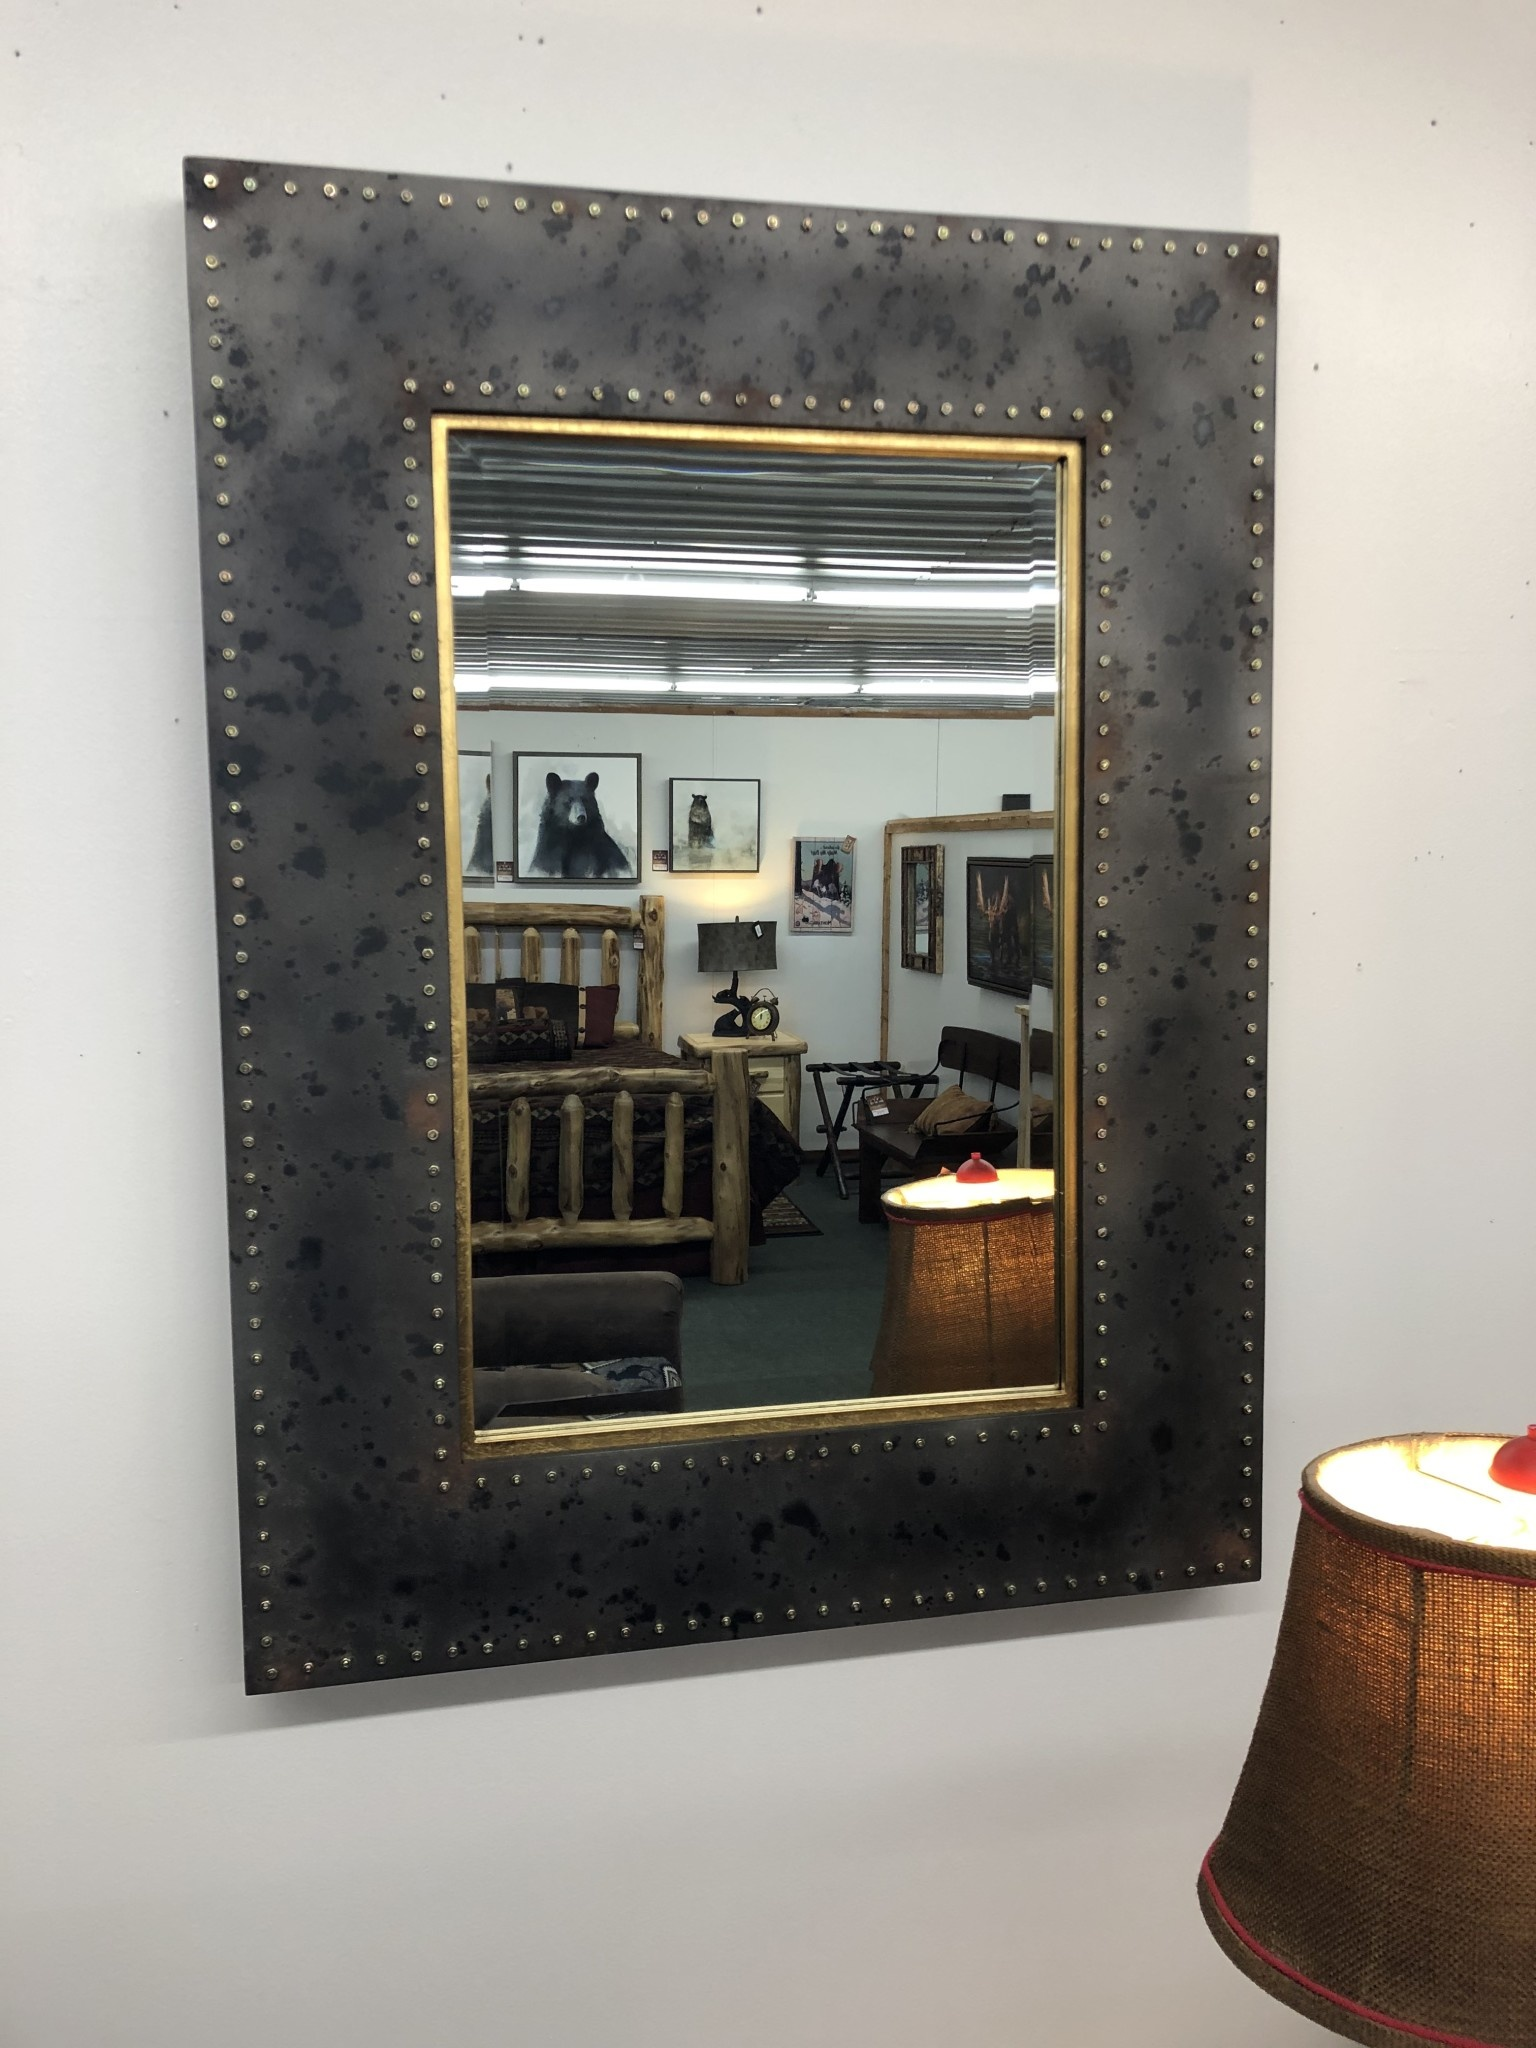 Uttermost Amparo Mirror in Oxidized Steel Gray 30x40x2